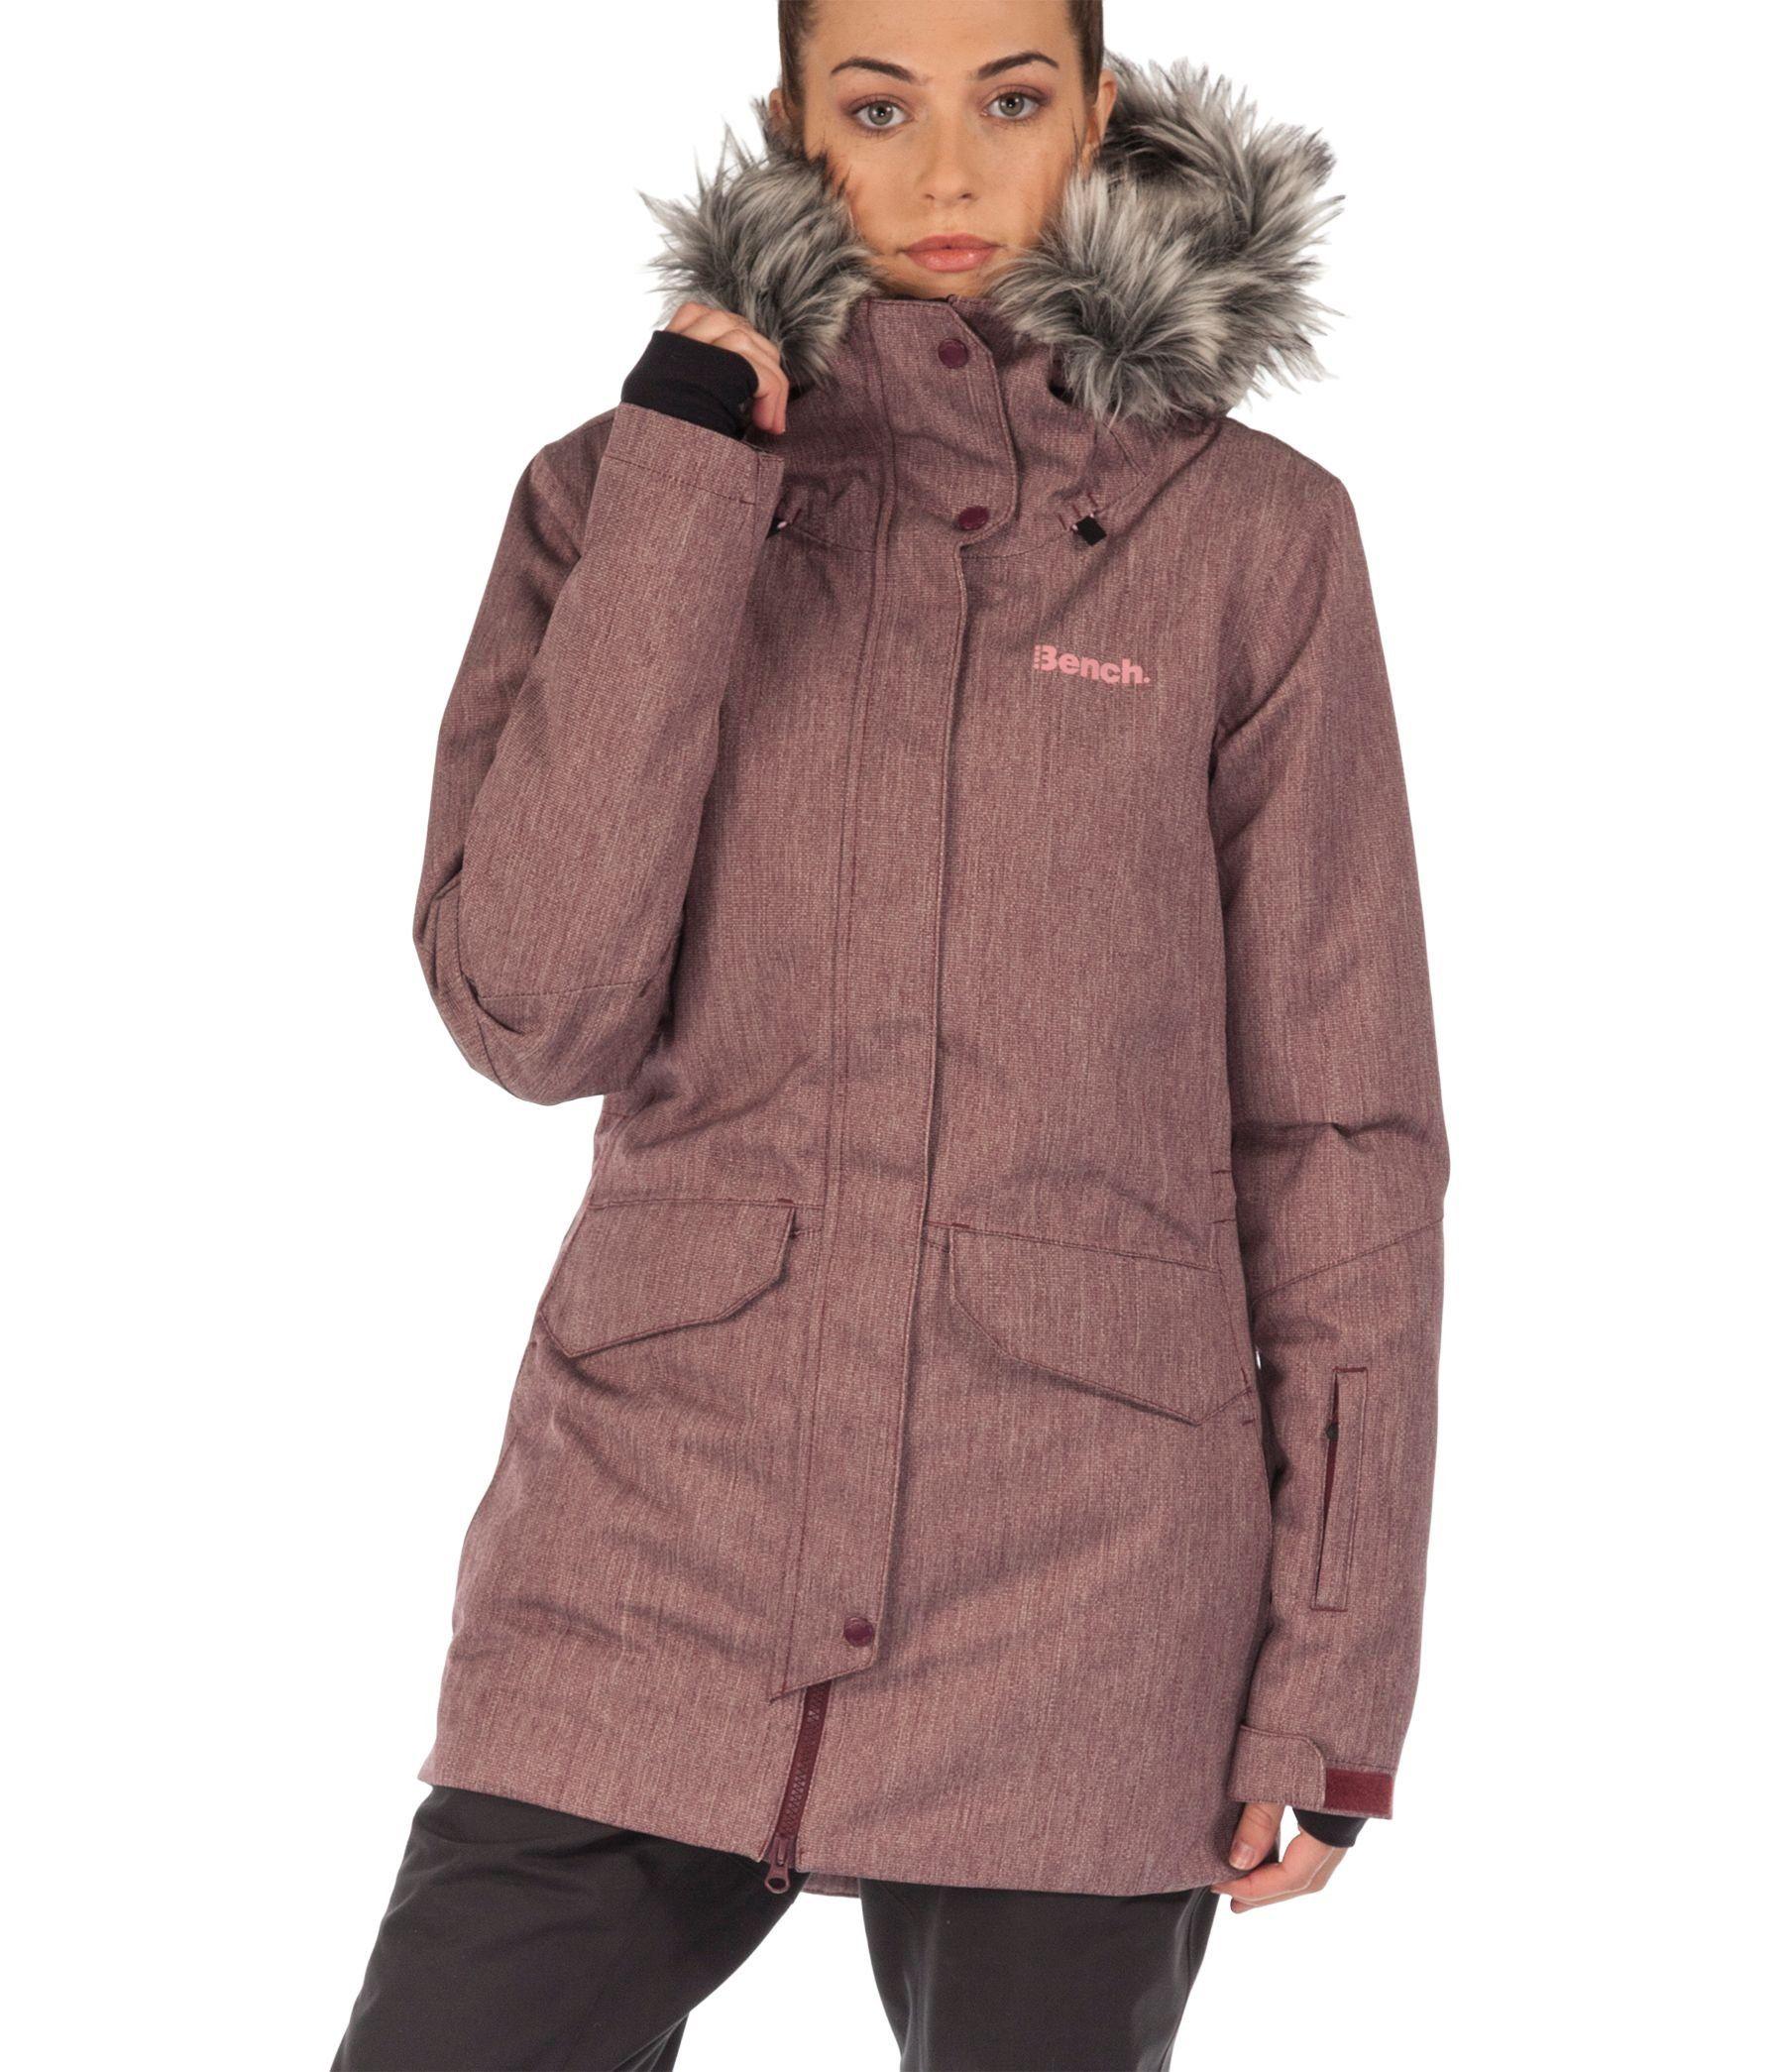 98 00 170 55 Bench Nightfall Women S Functional Jacket Amazon Co Uk Sports Outdoors Functional Jackets Jackets Winter Jackets Women [ 2090 x 1800 Pixel ]